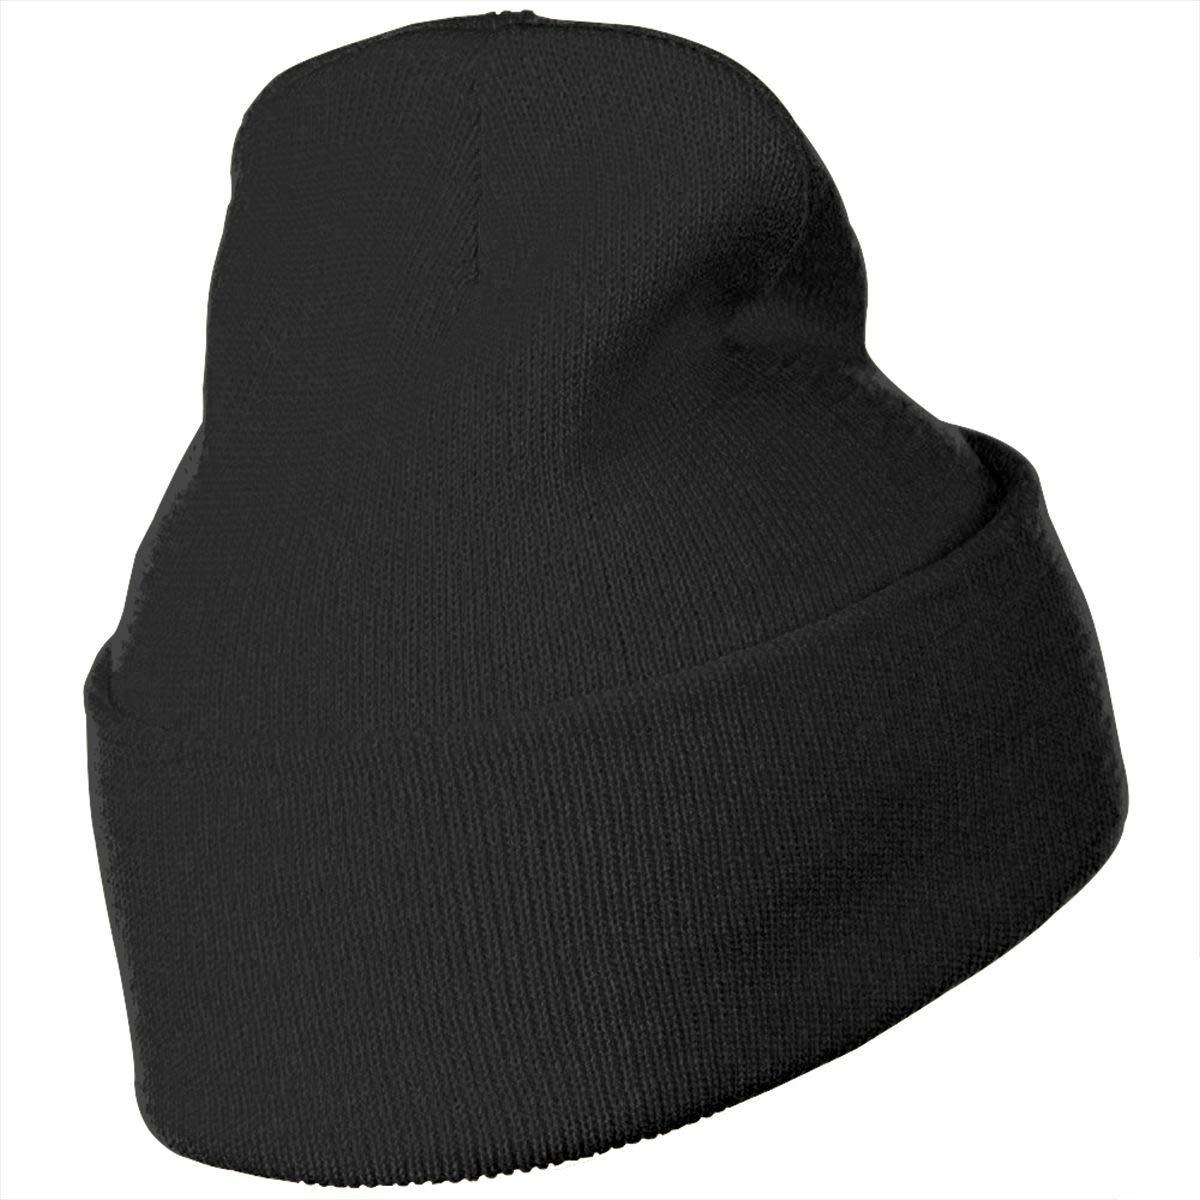 JimHappy Cute Cartoon Hat for Men and Women Winter Warm Hats Knit Slouchy Thick Skull Cap Black